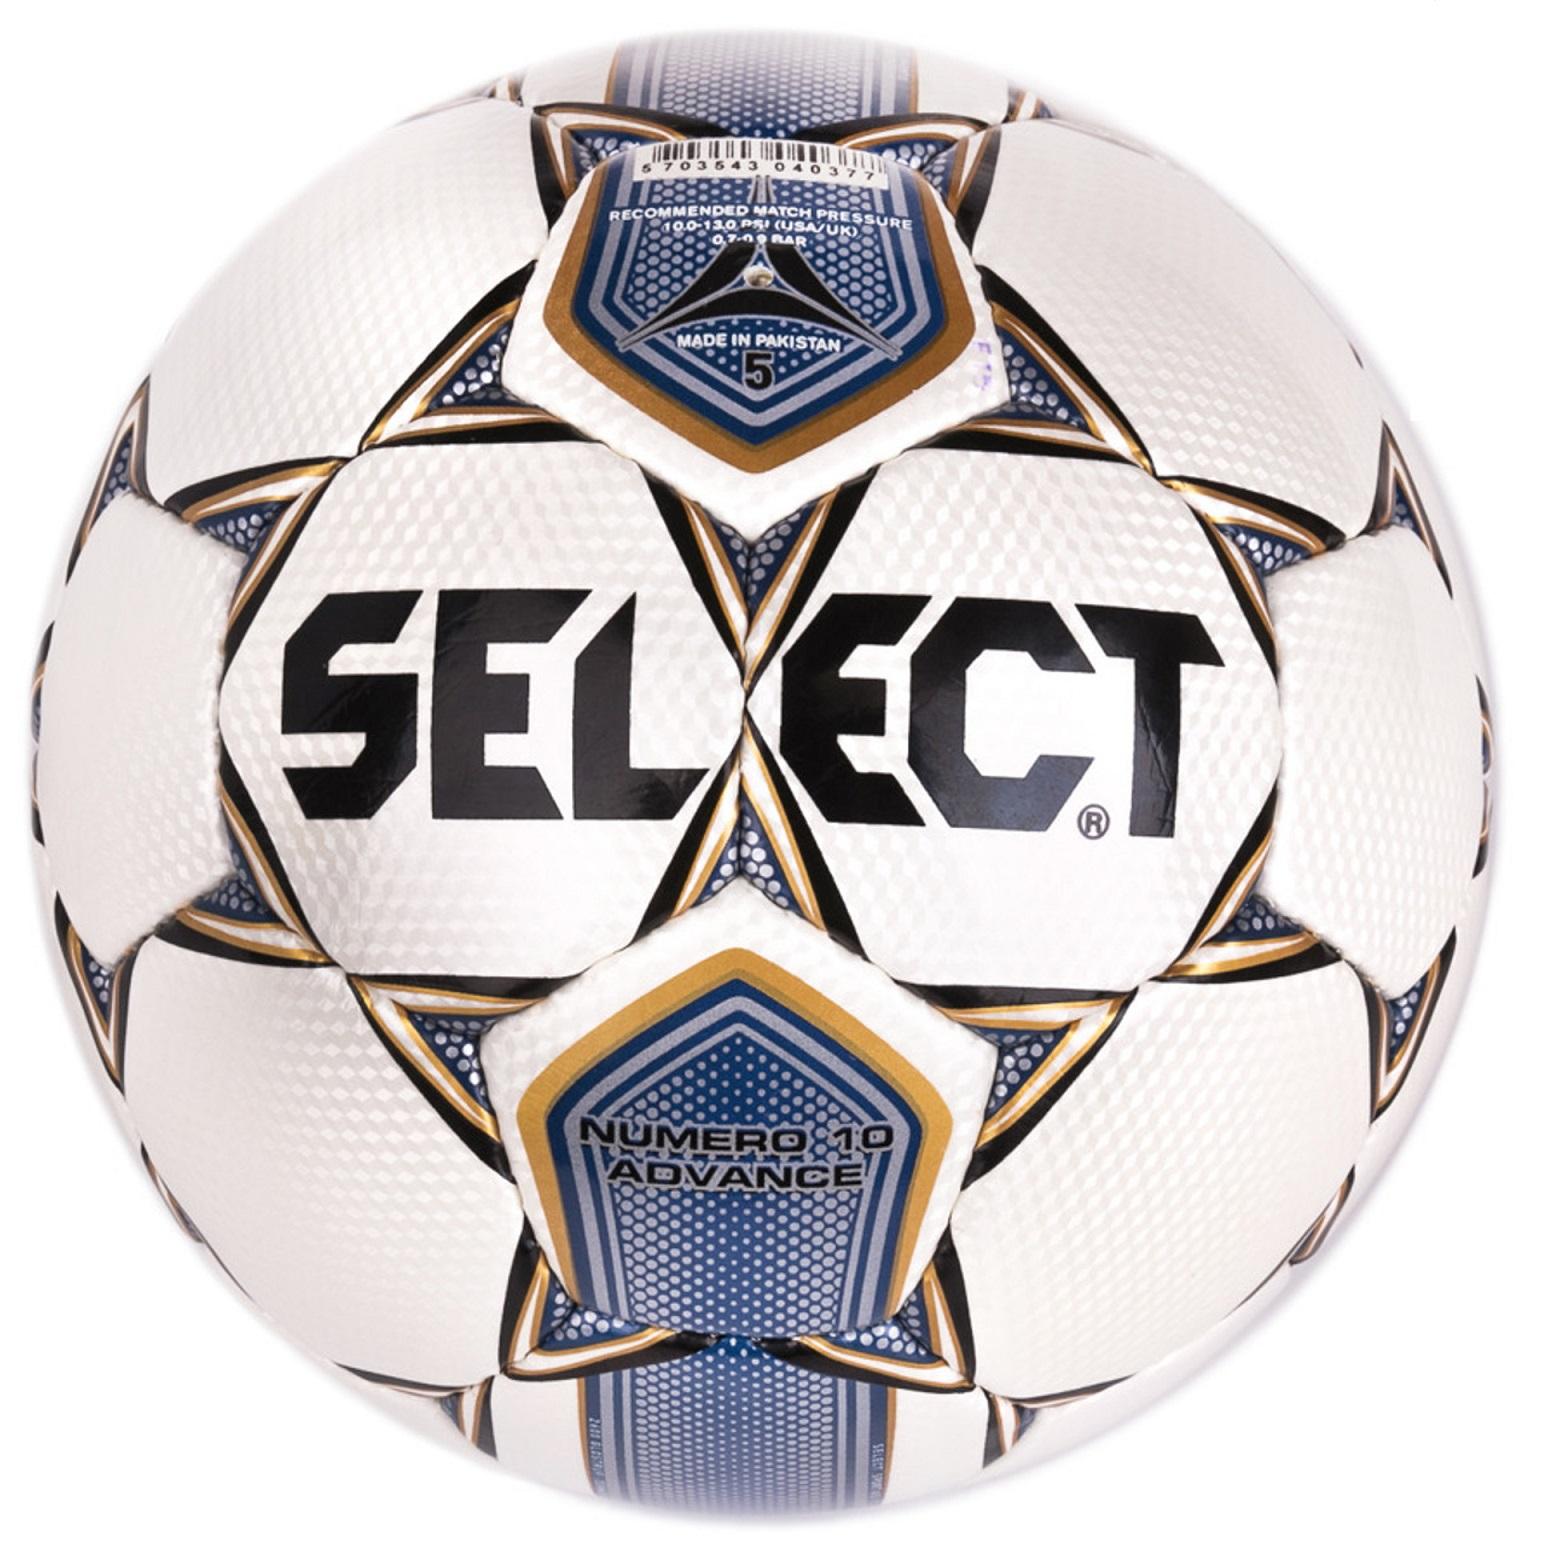 SportowaKraina.PL - Ball SELECT Numero 10 Advance size 5 525822af57b2